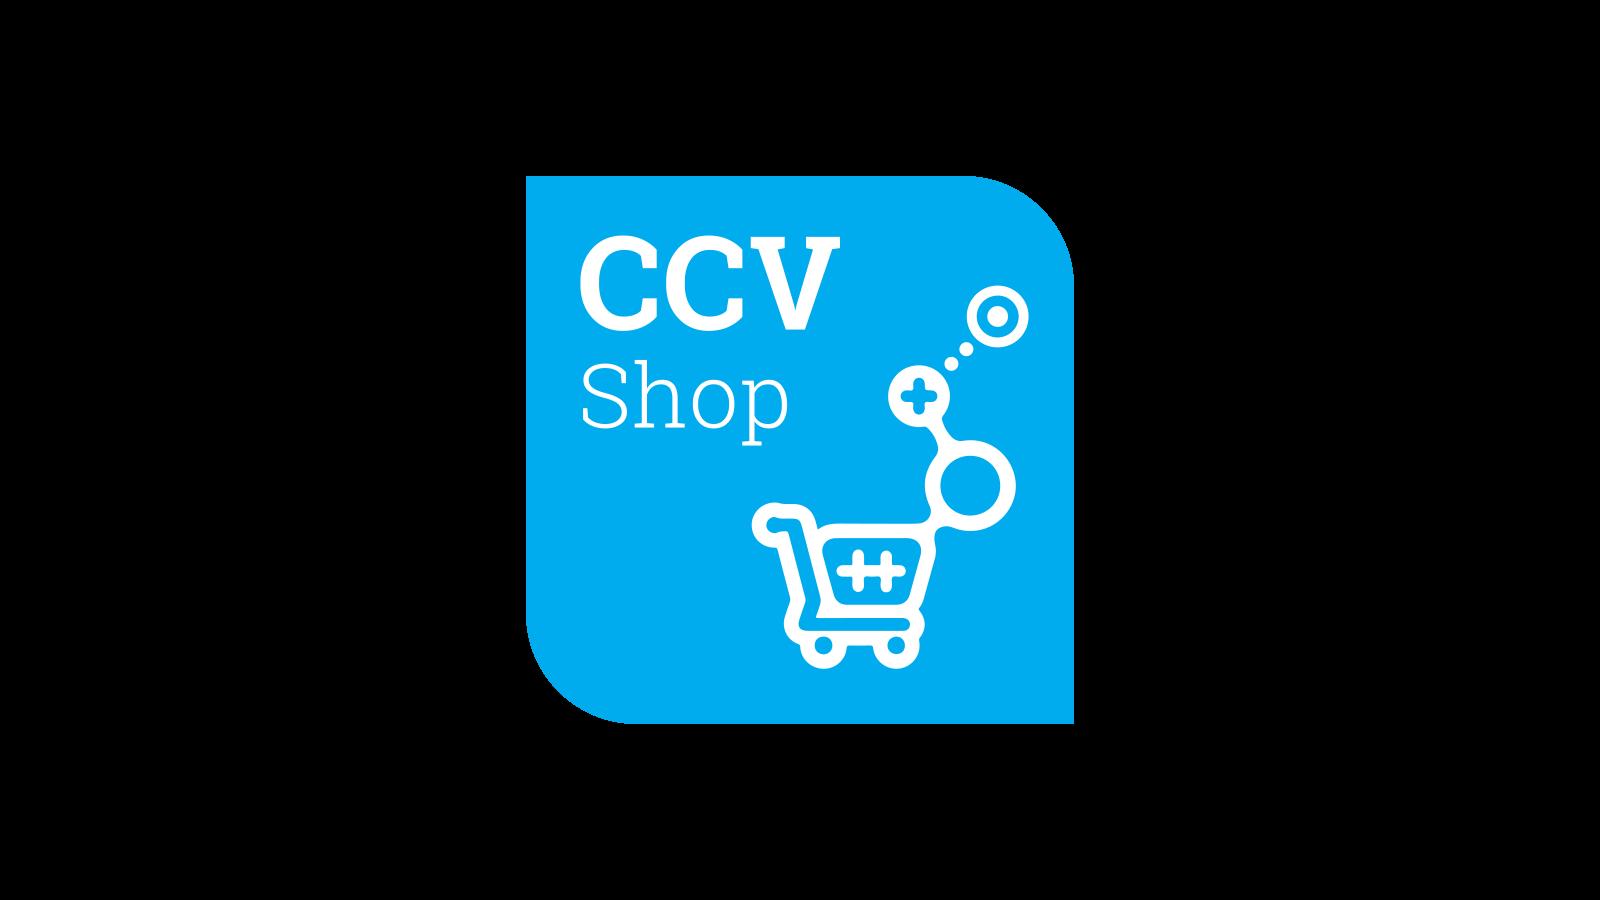 Logo CCV Shop webhosting